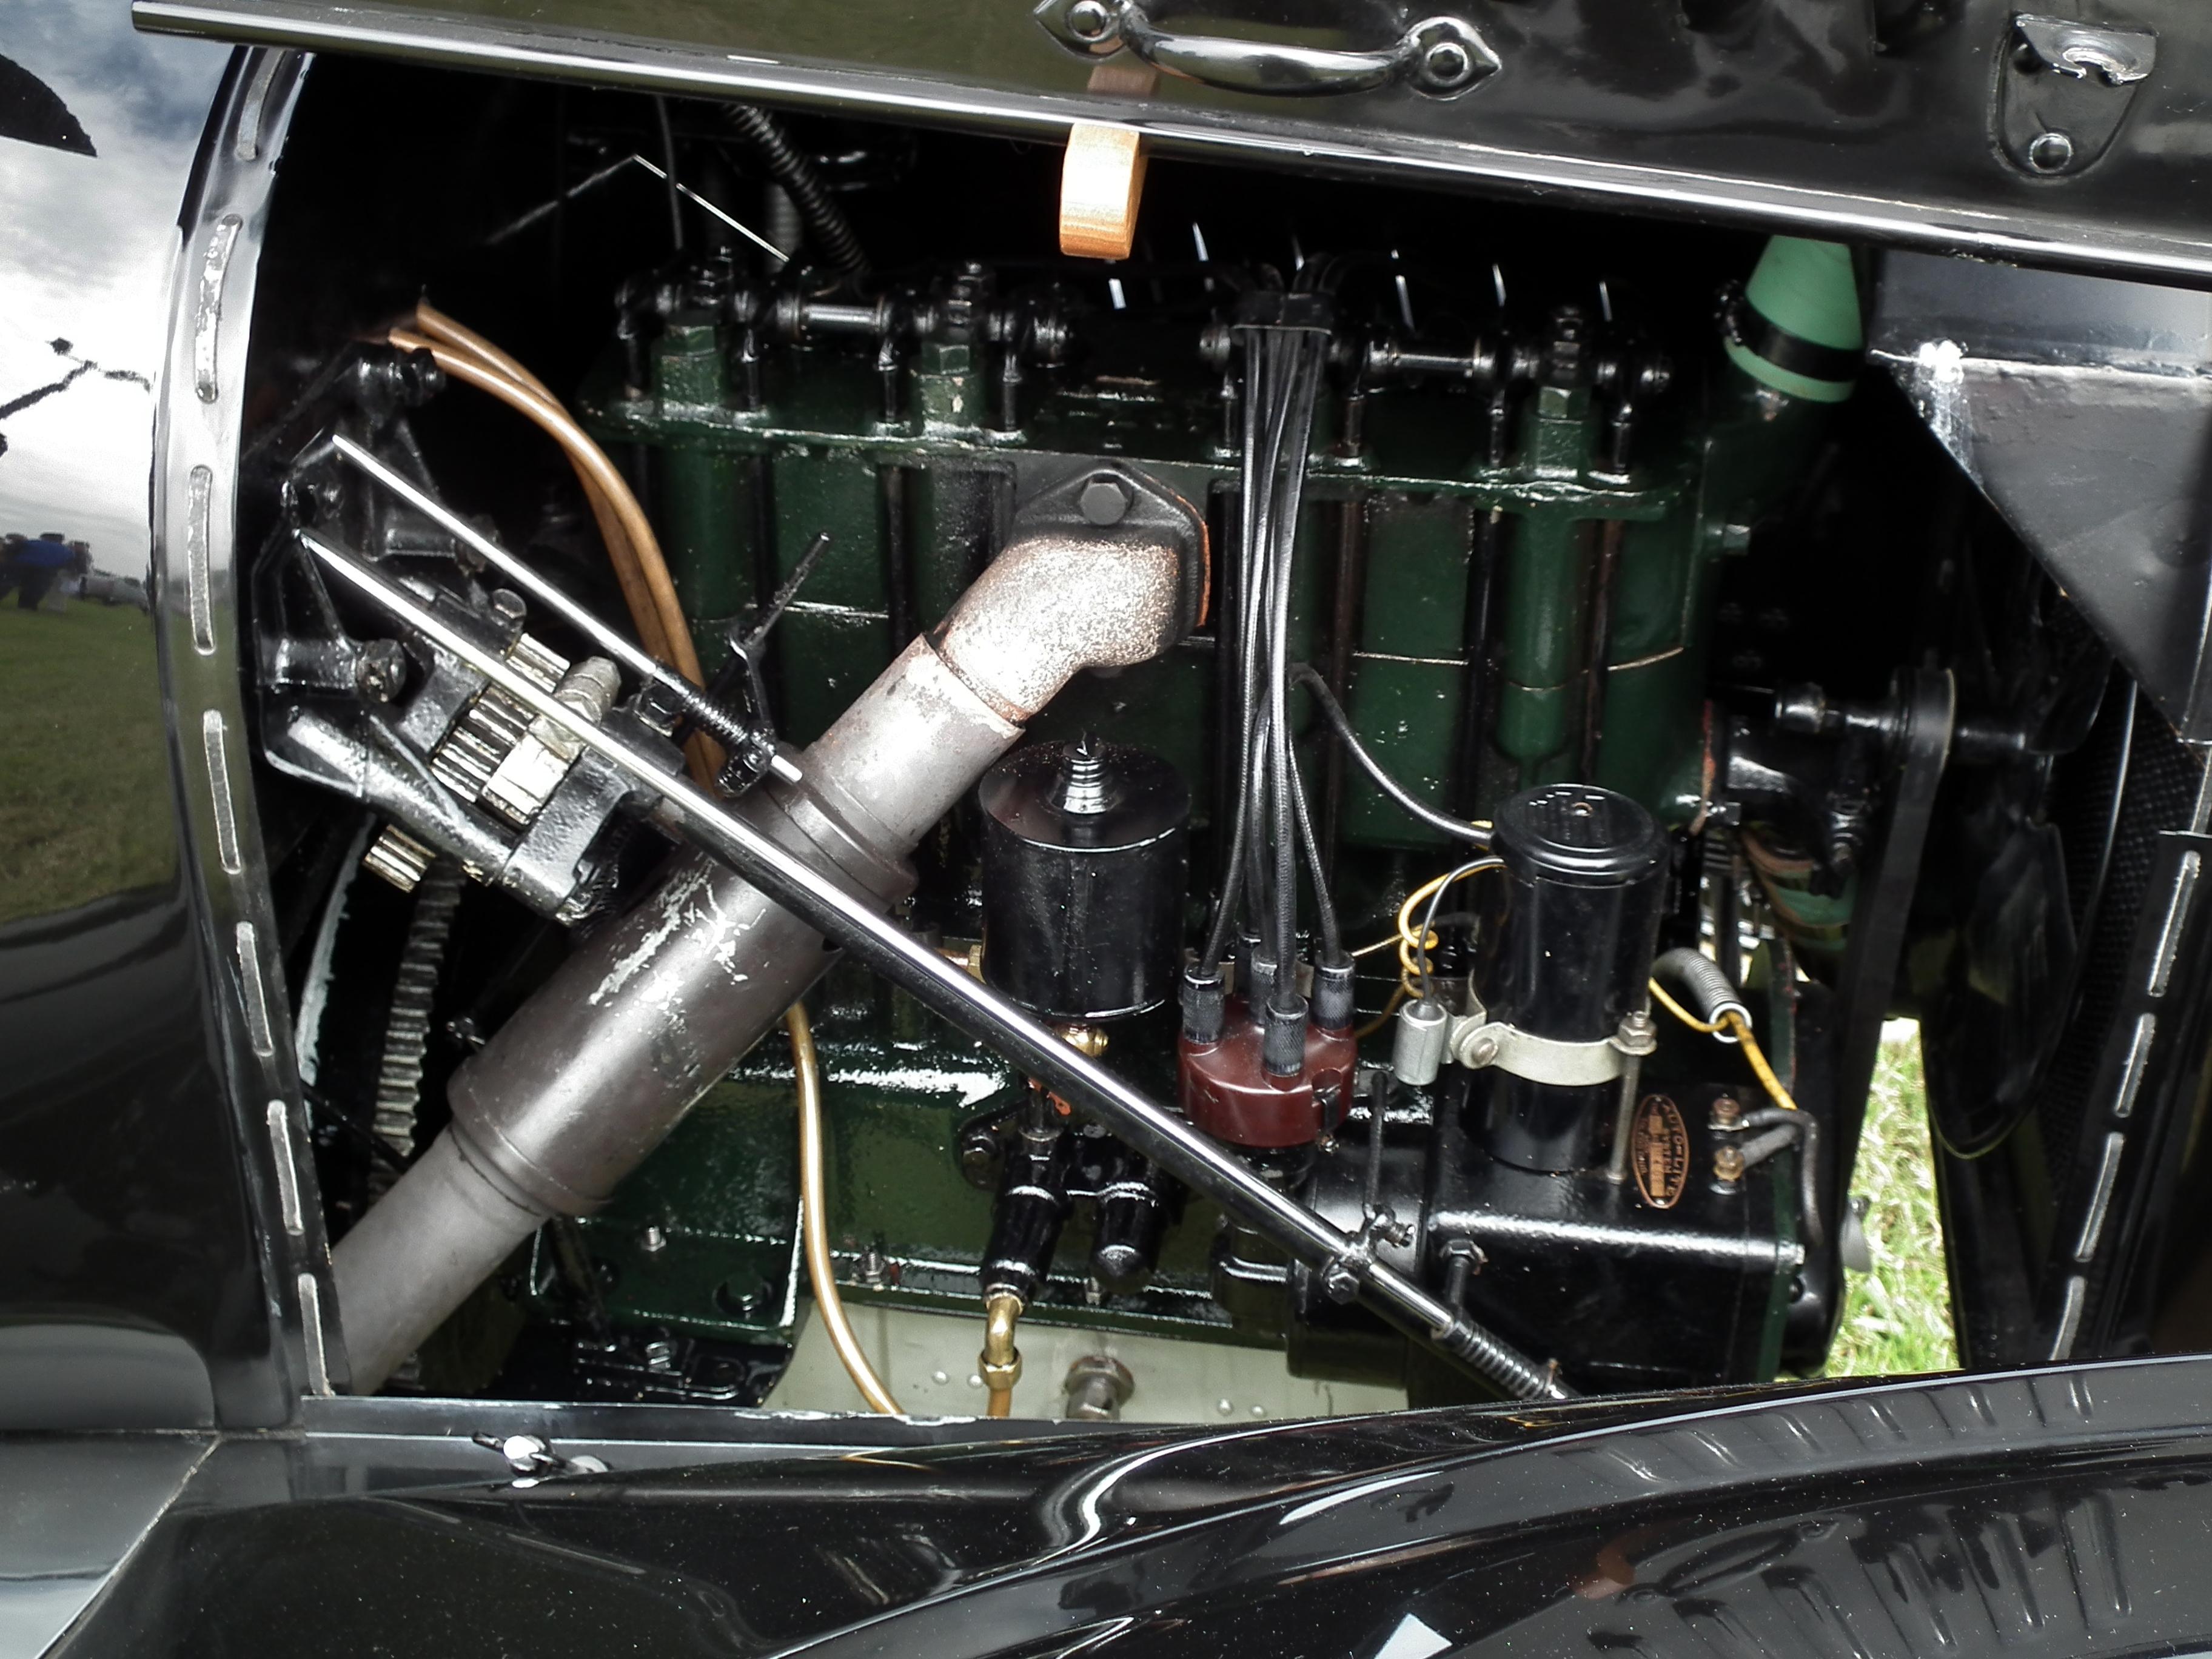 Chevrolet Inline-4 engine - Wikipedia